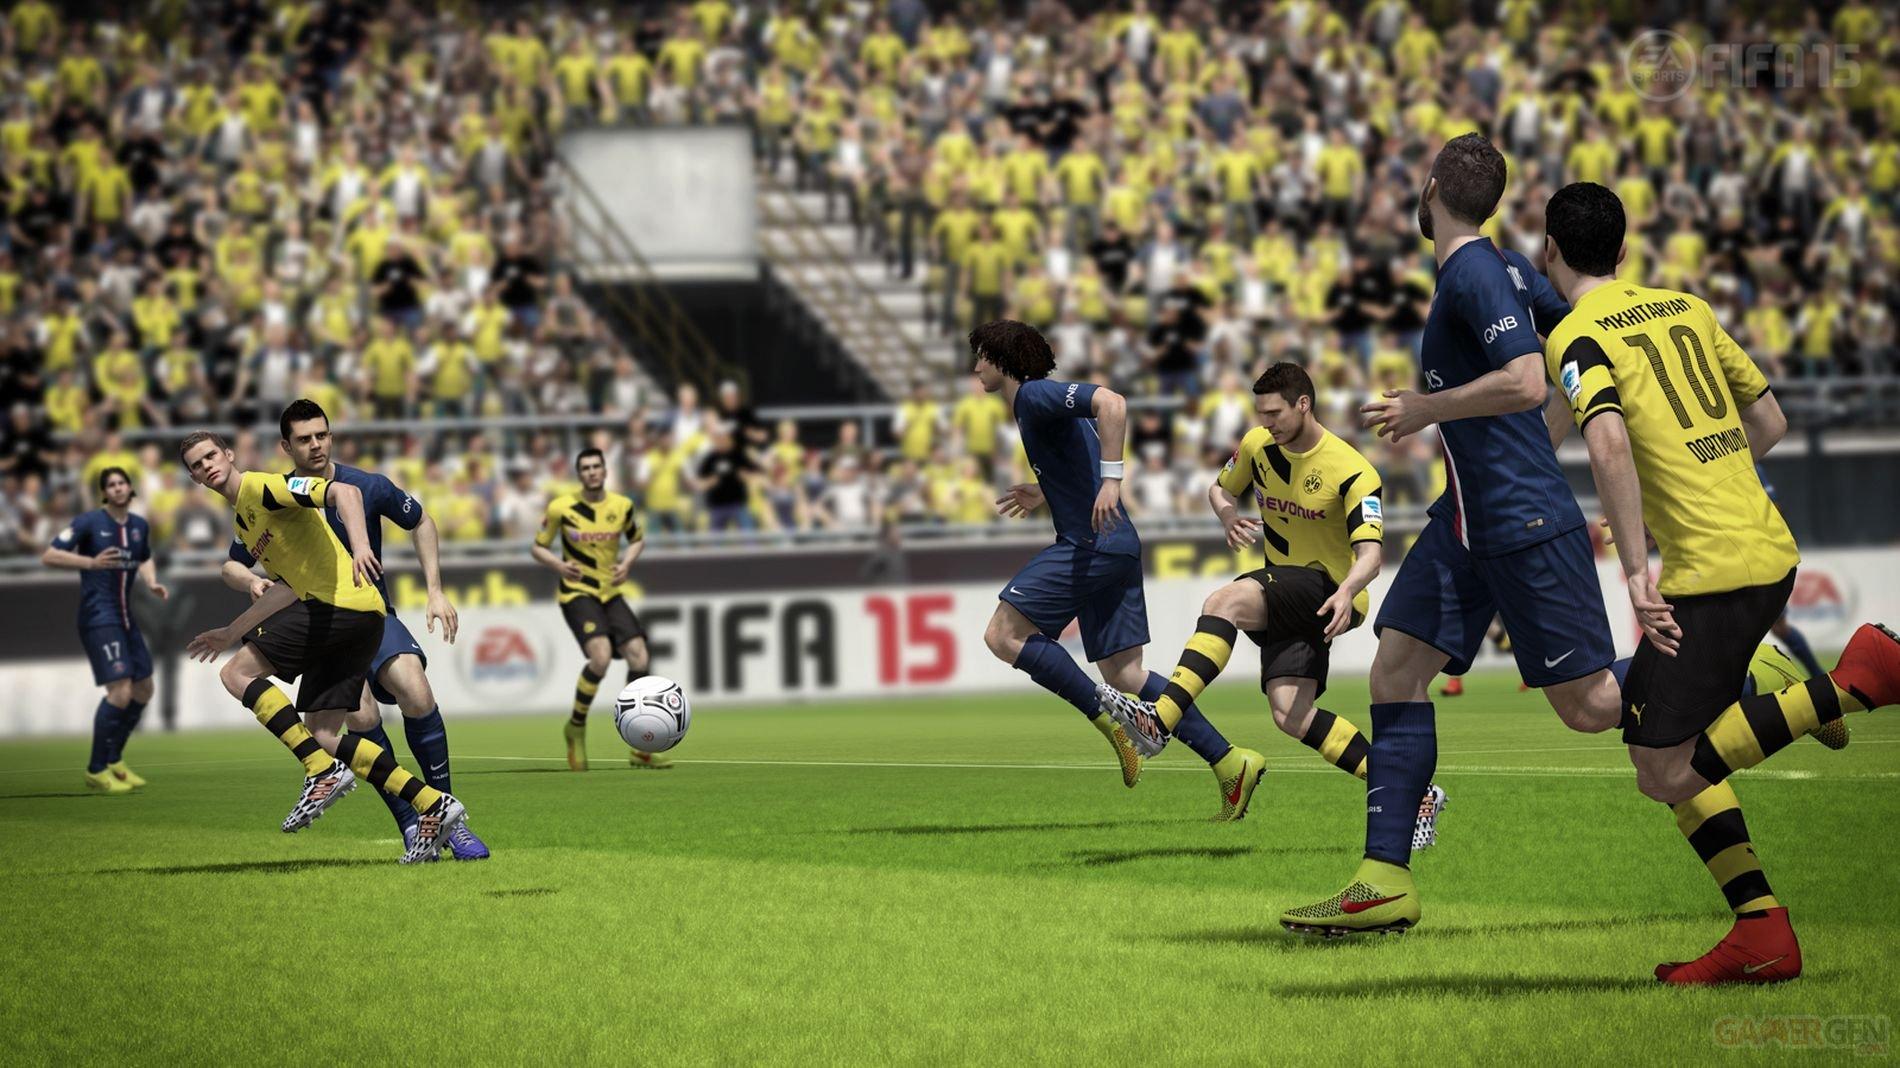 Fifa 15 De